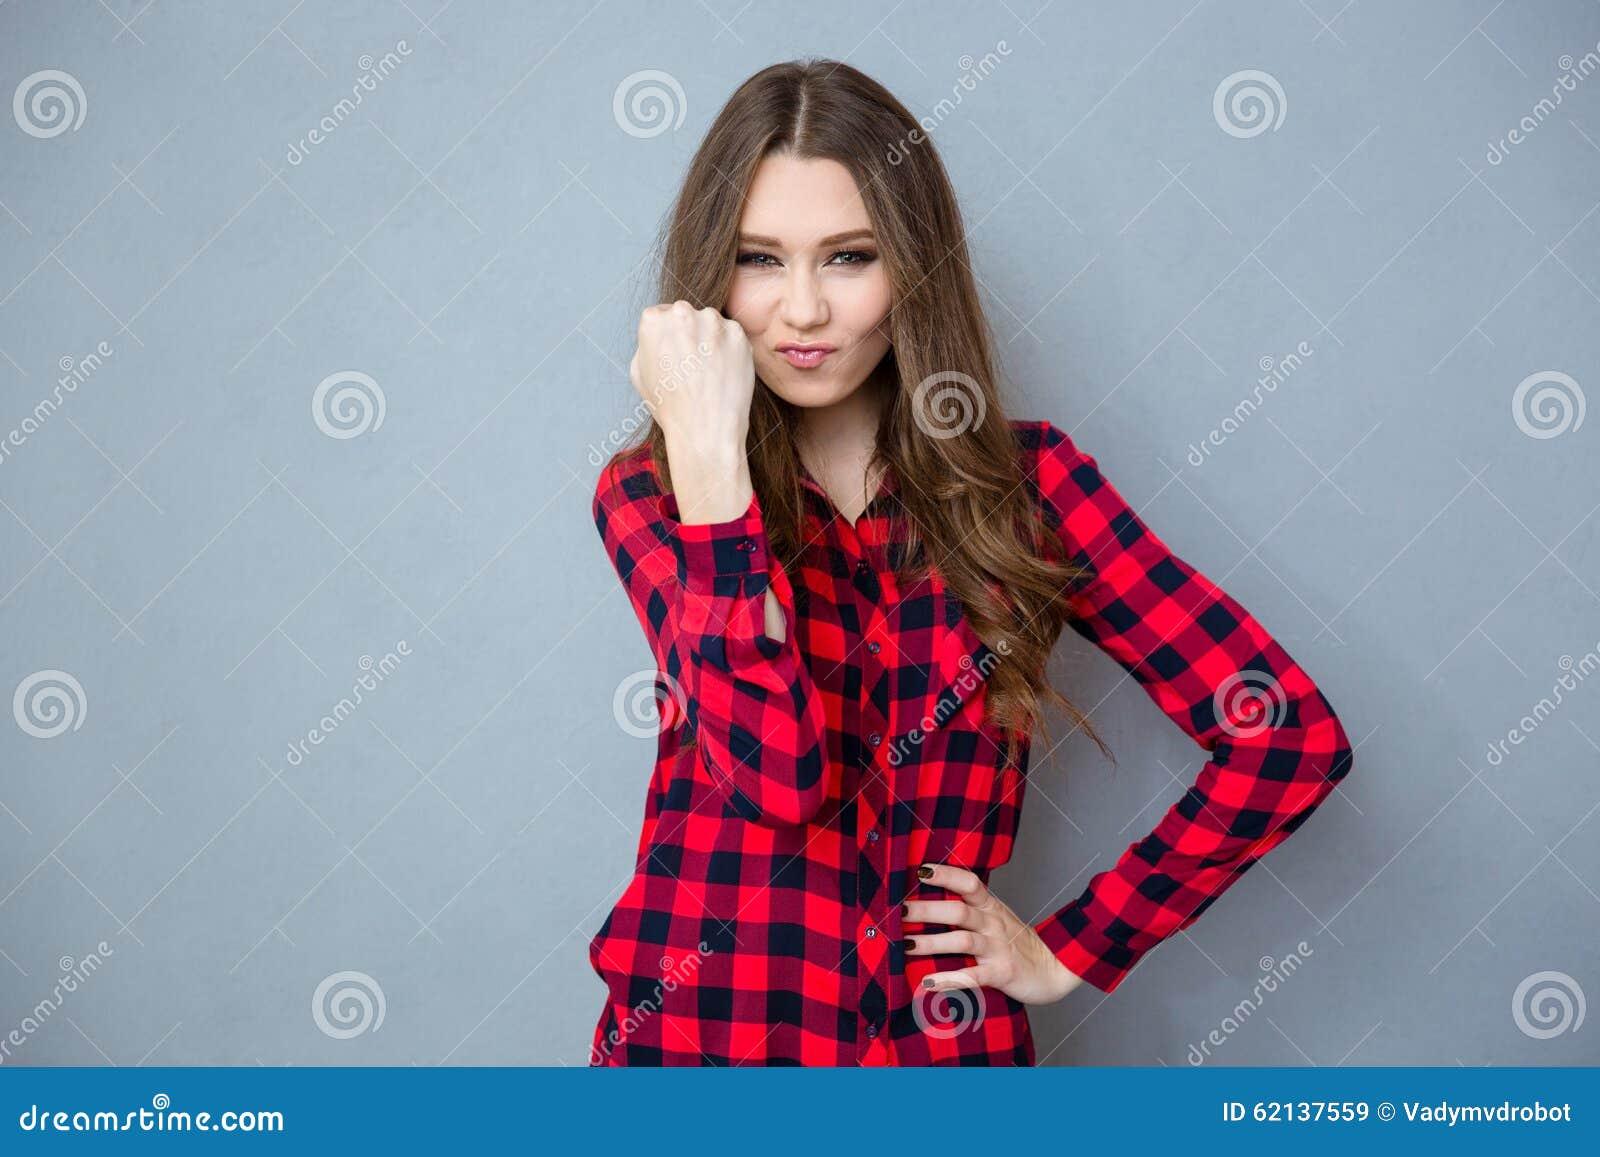 Девочка с кулочком фото фото 254-726